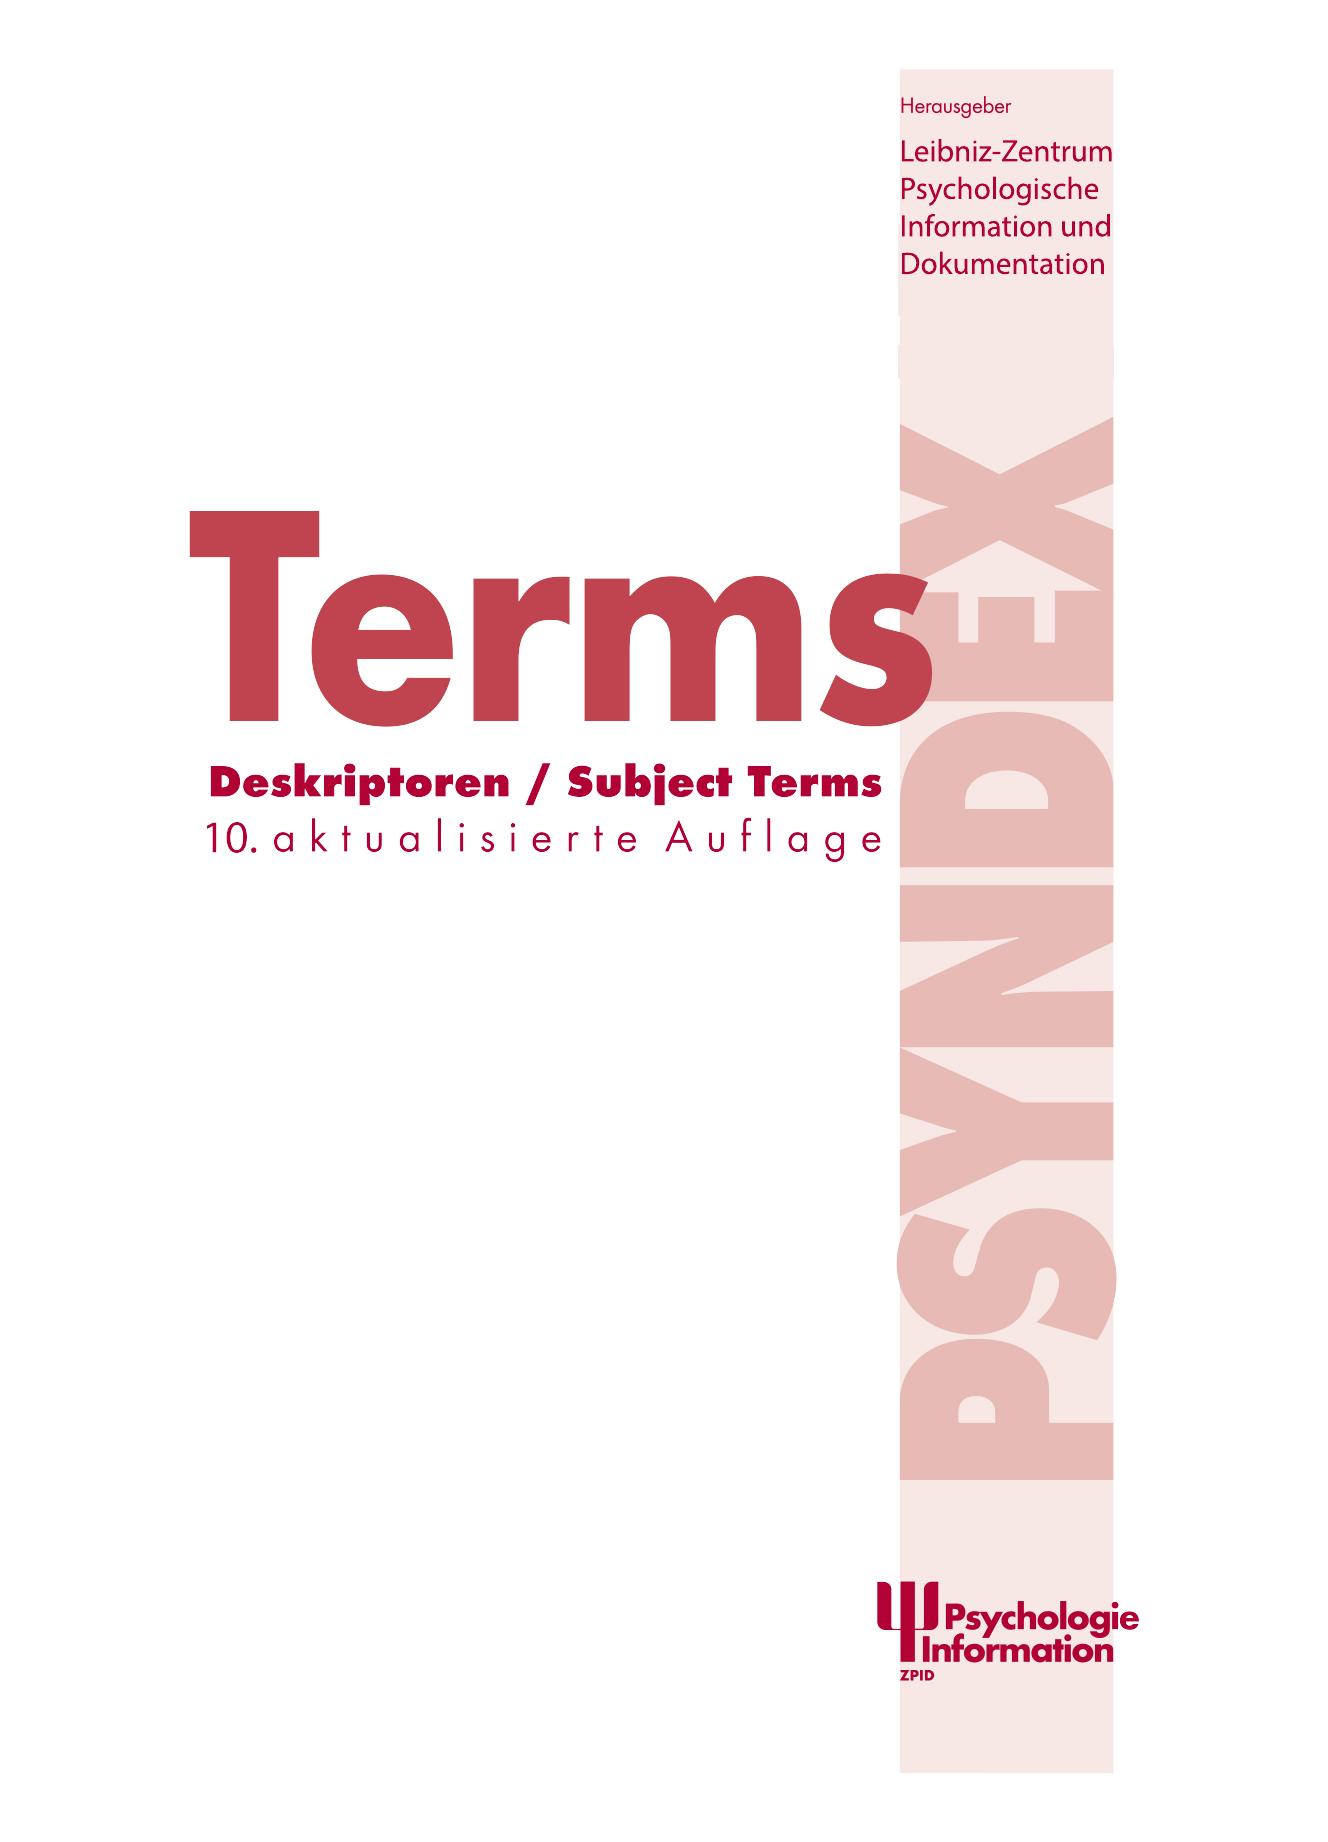 Deskriptoren / Subject Terms zur Datenbank PSYNDEX